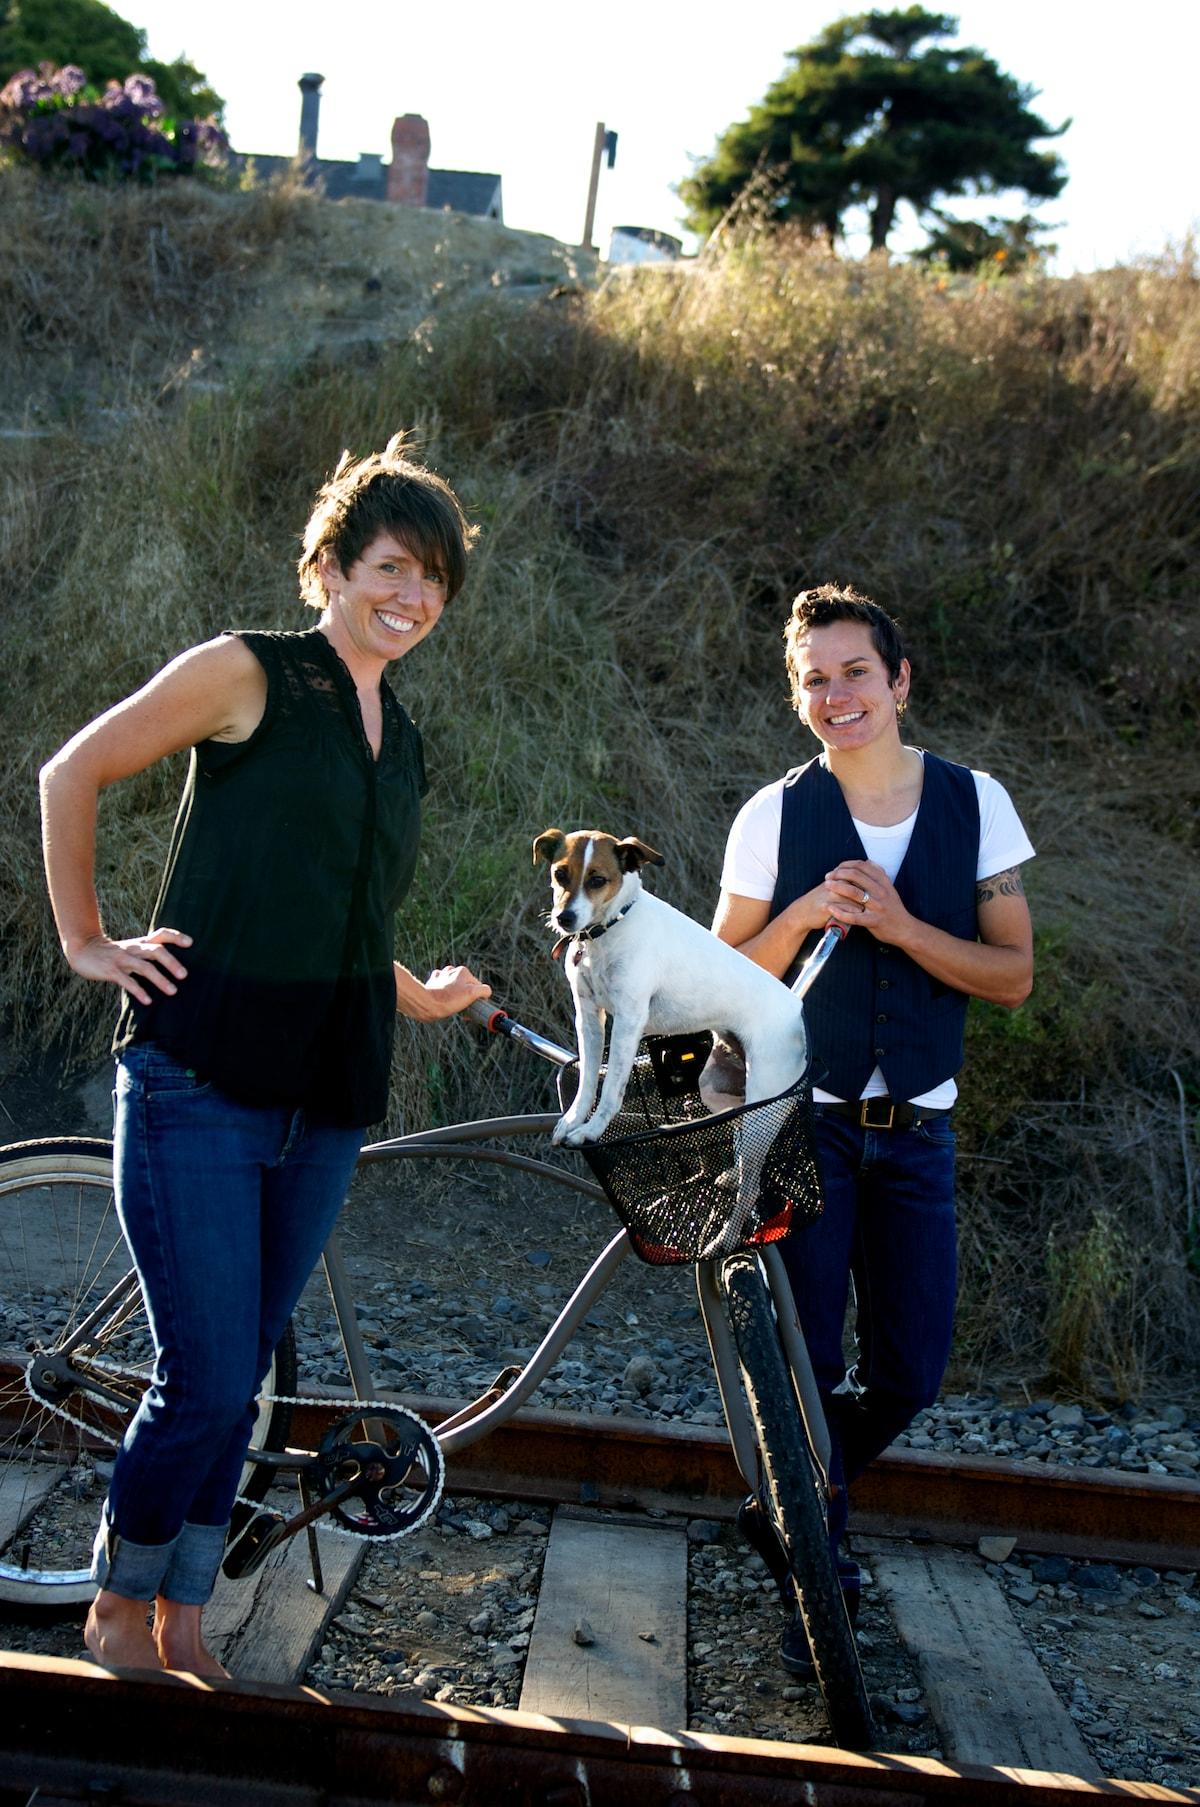 Shannon & Neva from Santa Cruz